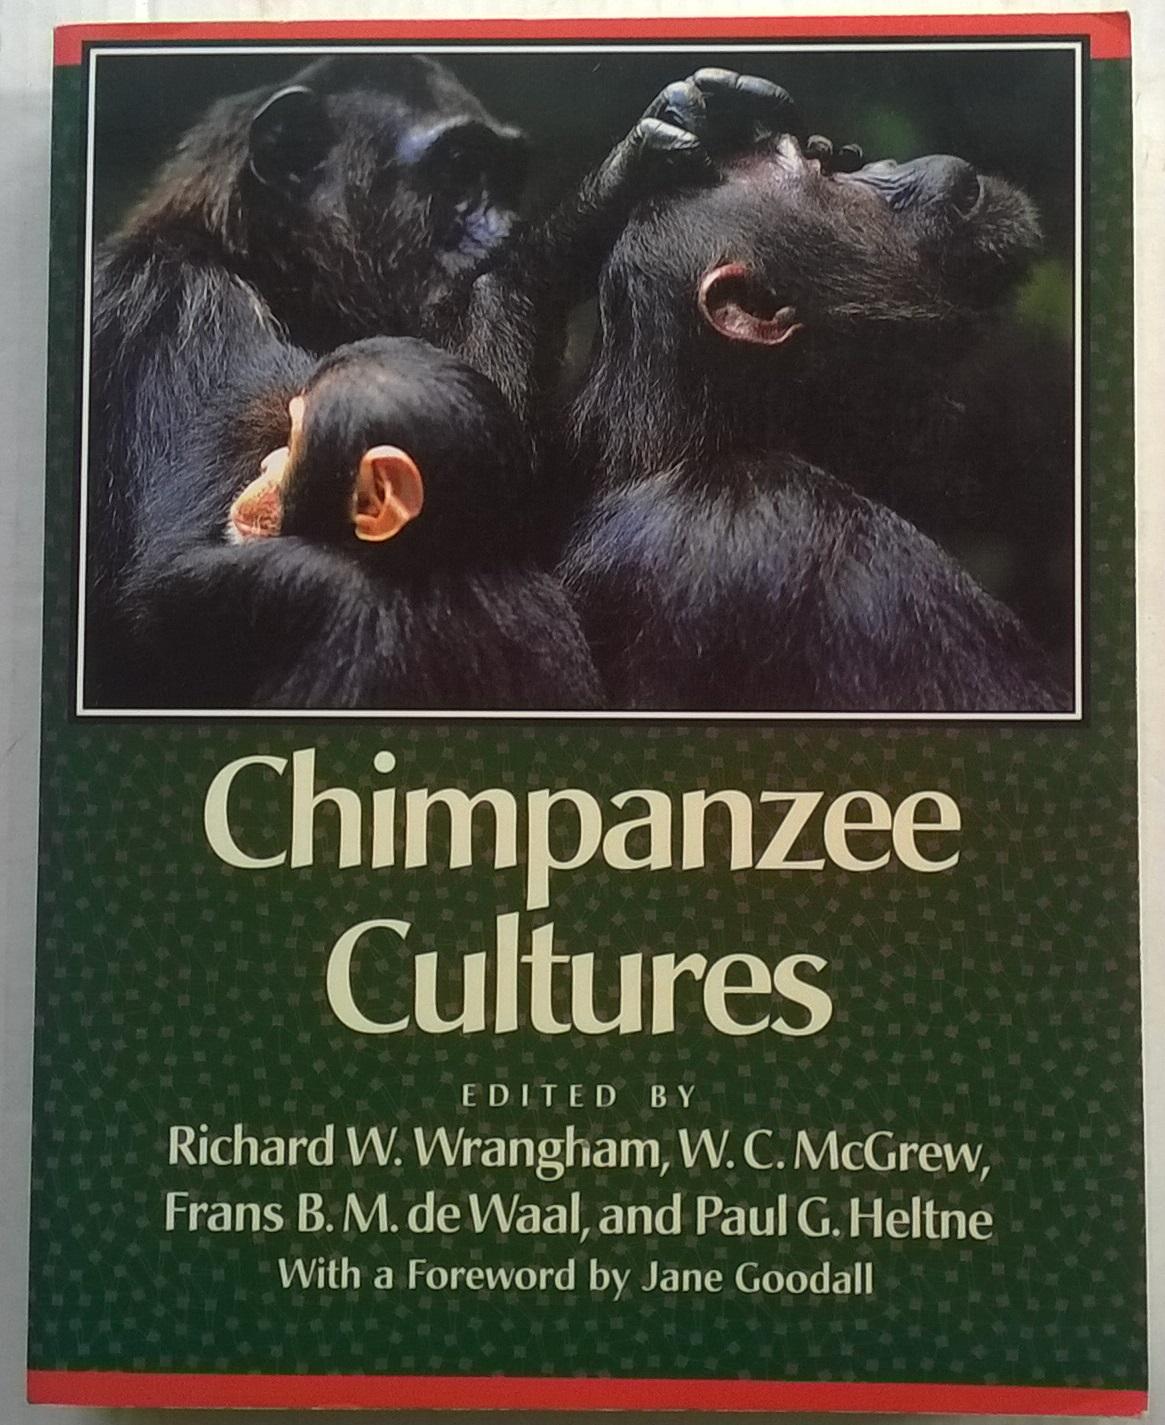 Chimpanzee Cultures :, Wrangham, Richard W ;McGrew, W C, de Waal, Frans B M and Heltne, Paul G (eds)